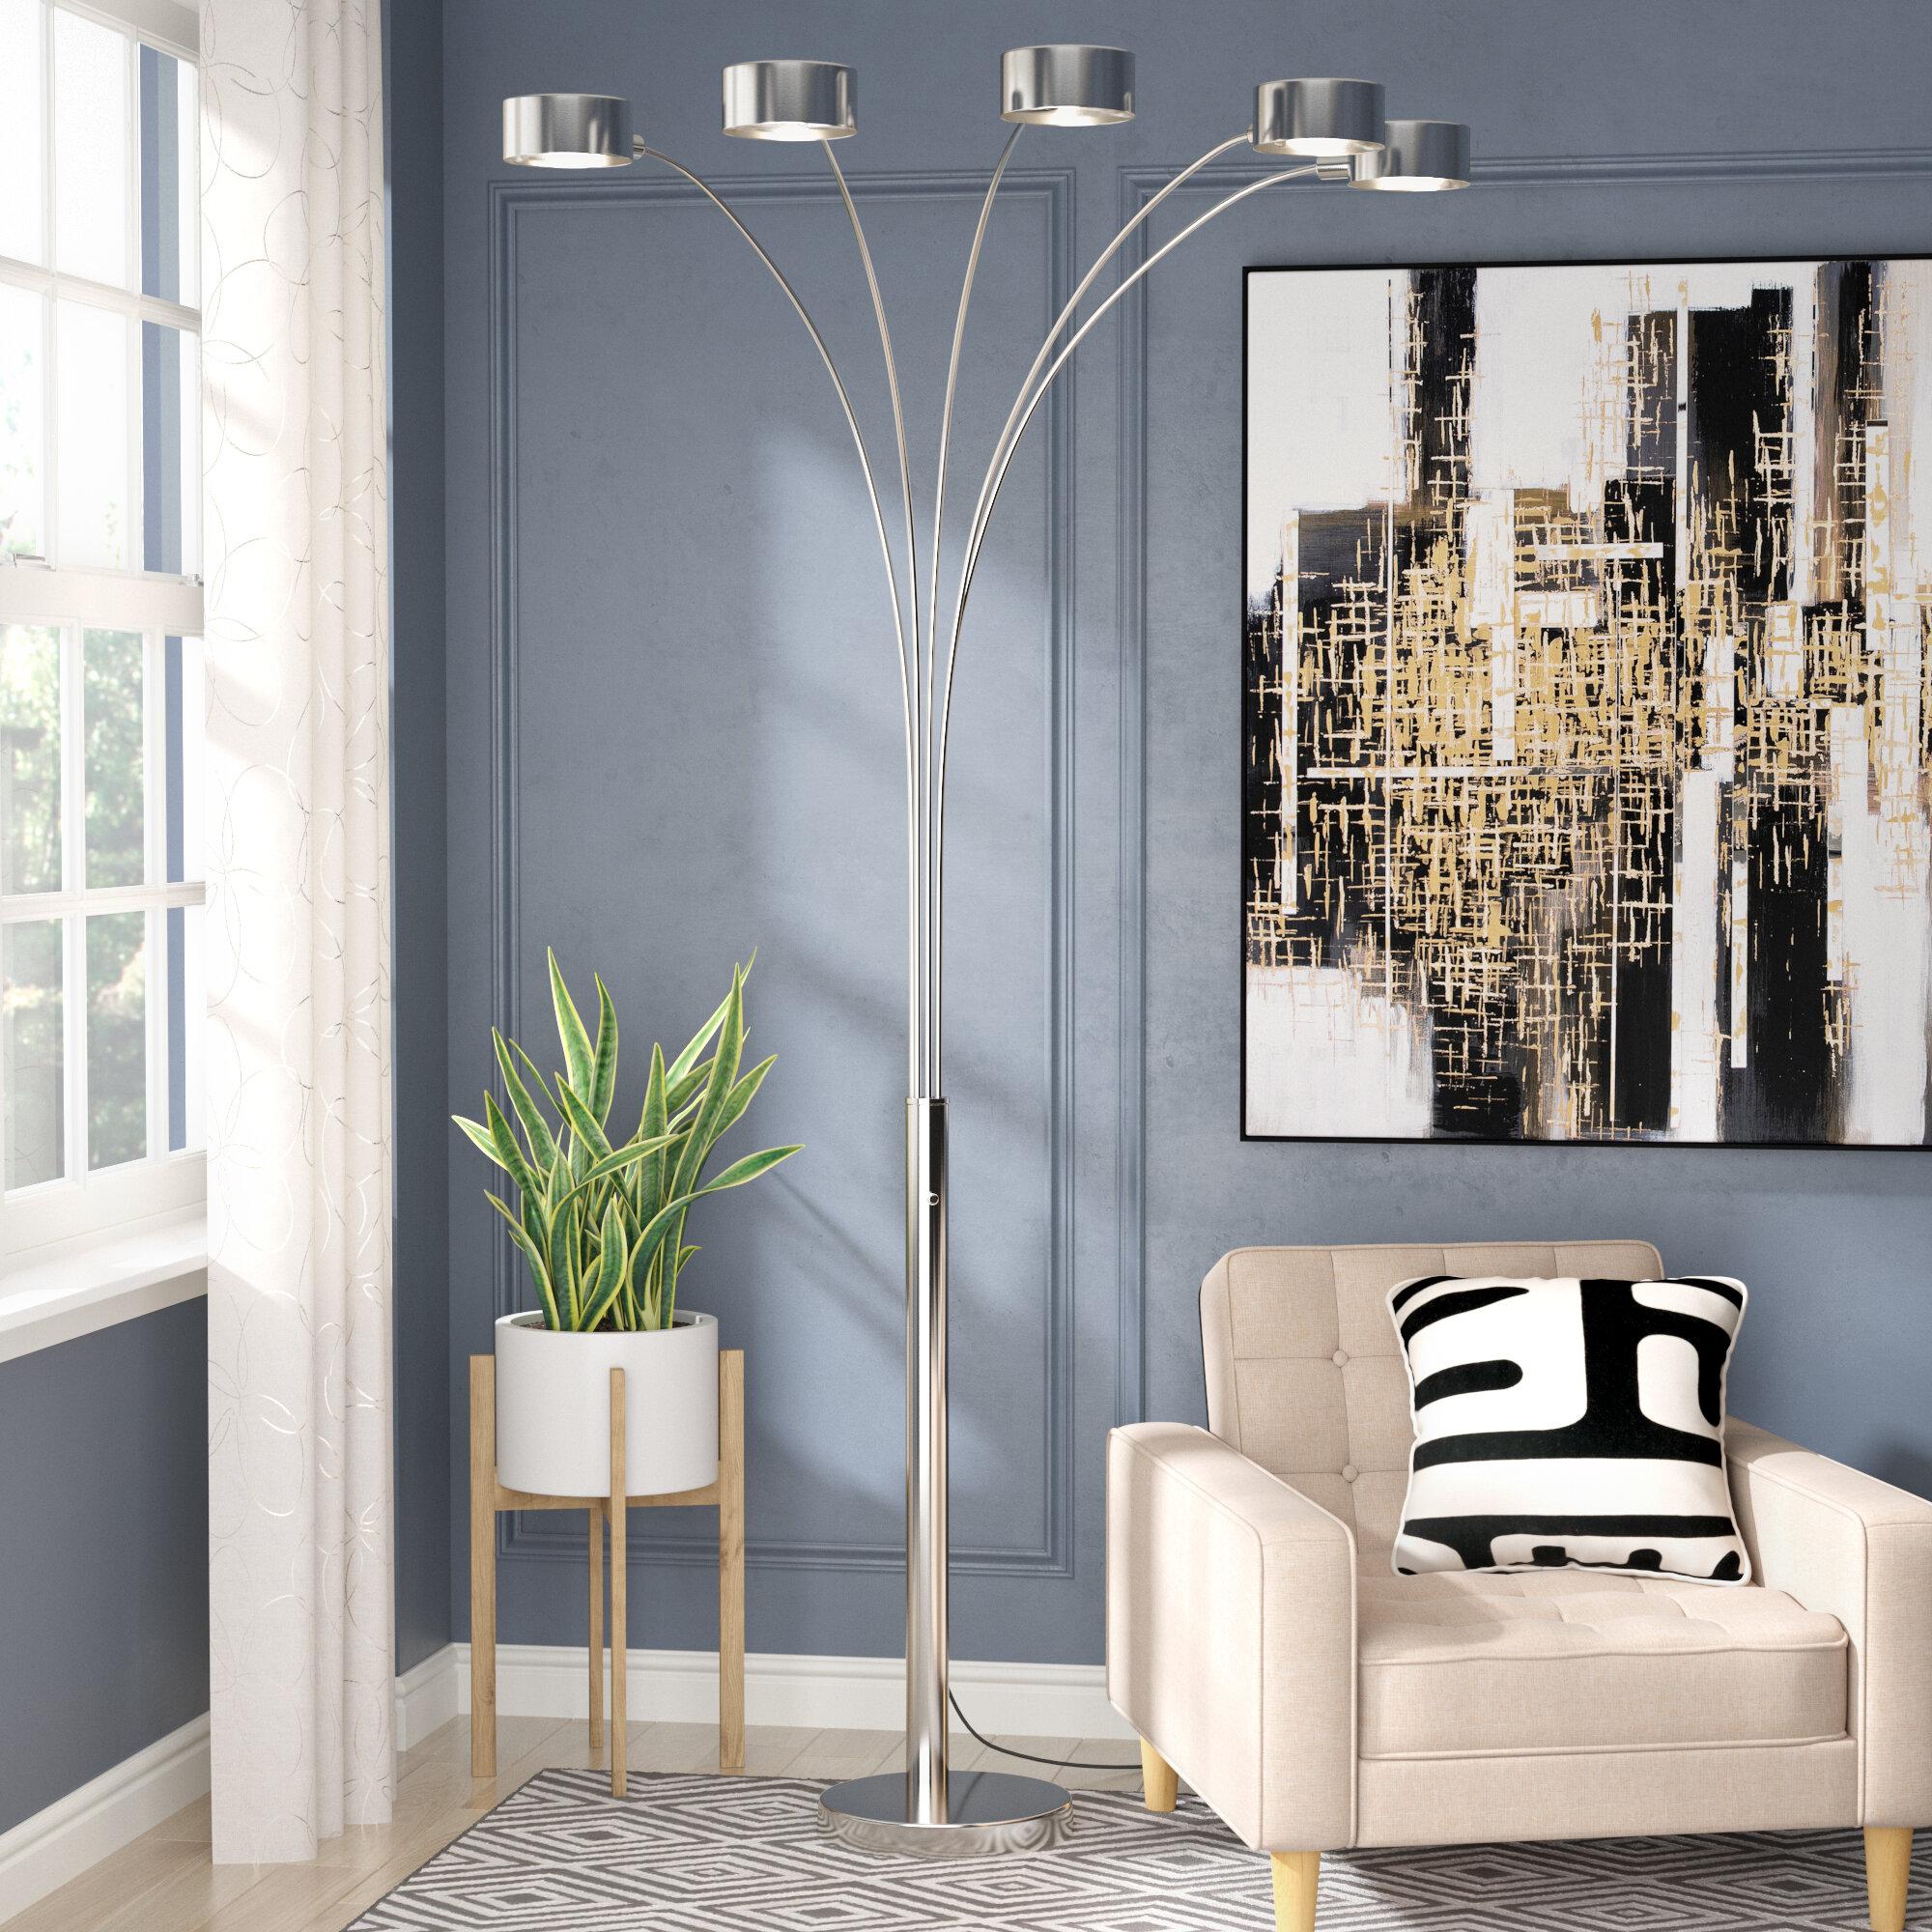 Orren Ellis Mccary 88 Led Tree Floor Lamp Reviews Wayfair 3 Way Dimmer Switch Rona